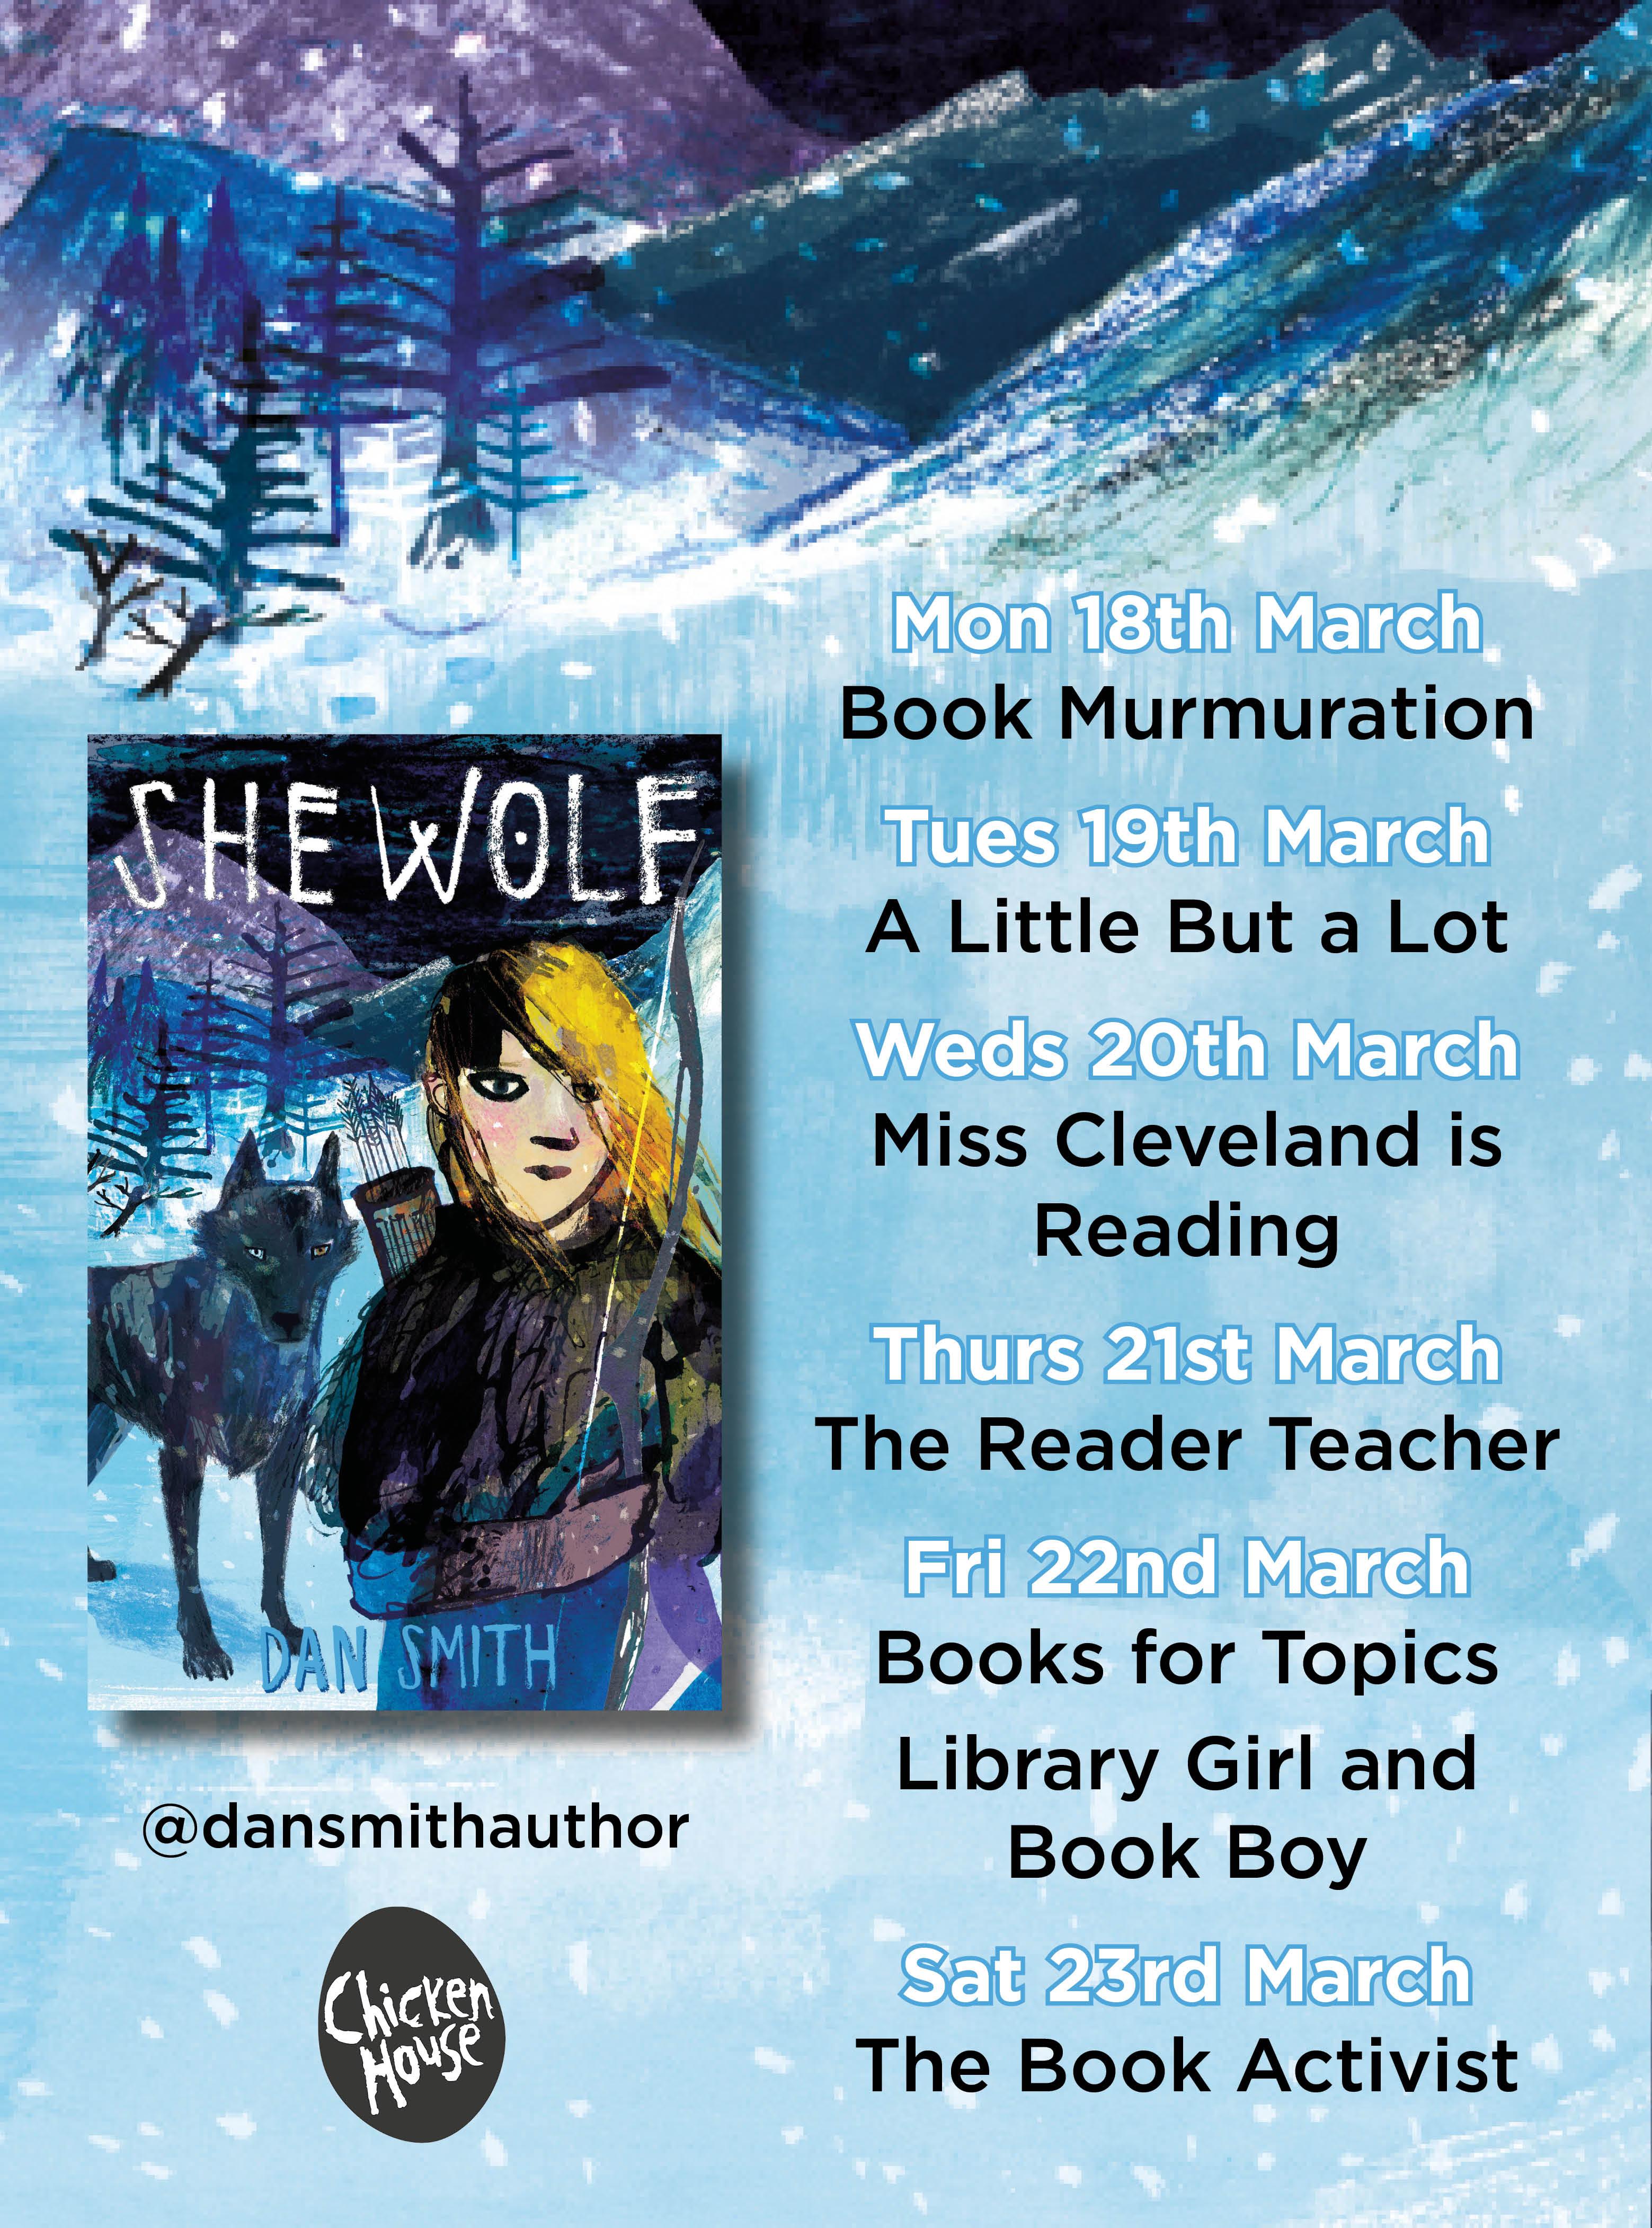 She Wolf blog tour banner